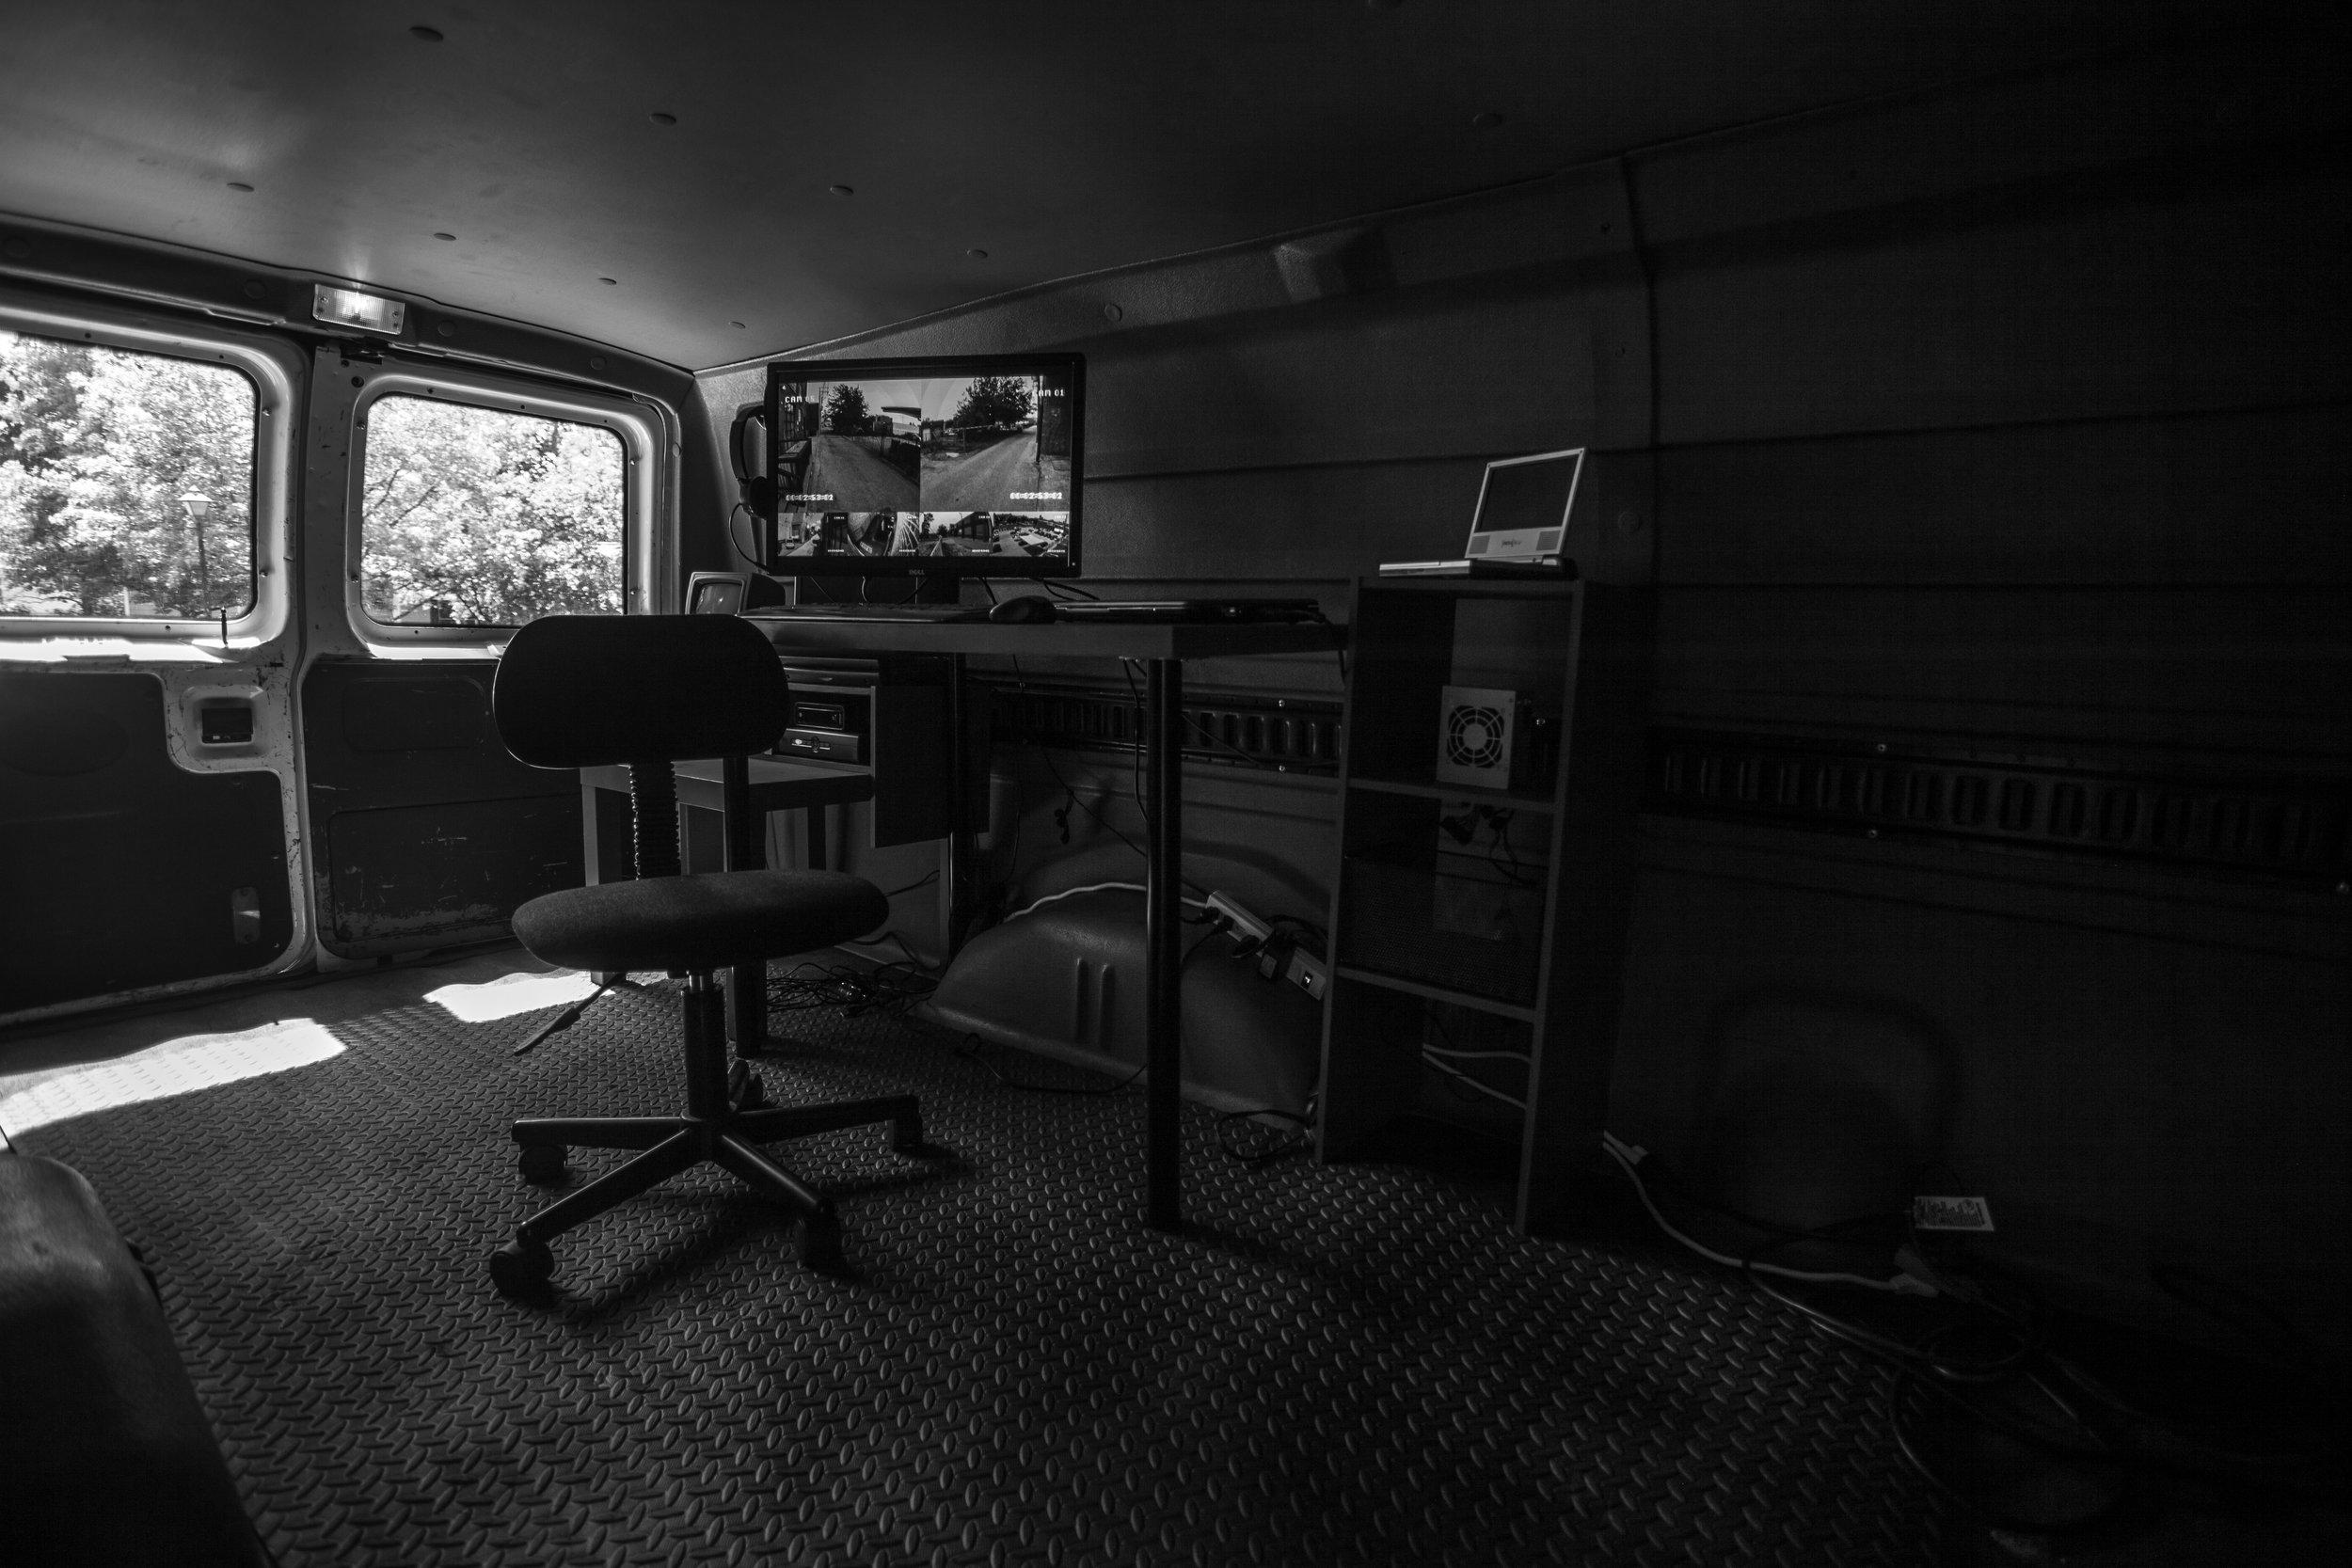 surveillance Van -